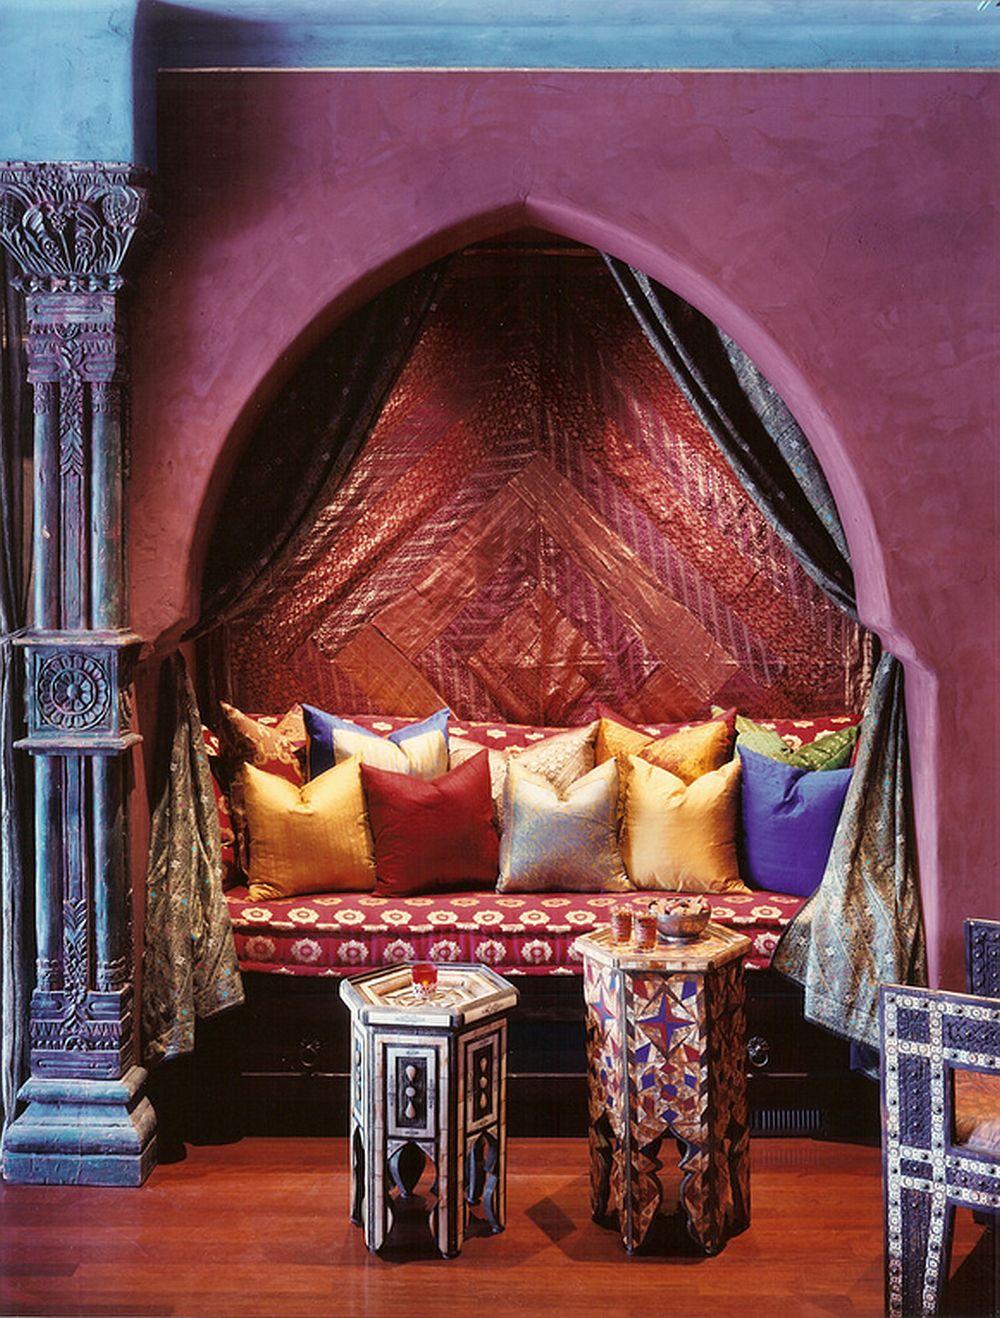 adelaparvu.com despre casa in stil marocan, maroccan kasbah, design interior Barry Johnson, arh Louie Leu, Foto Sharon Risedorph (5)